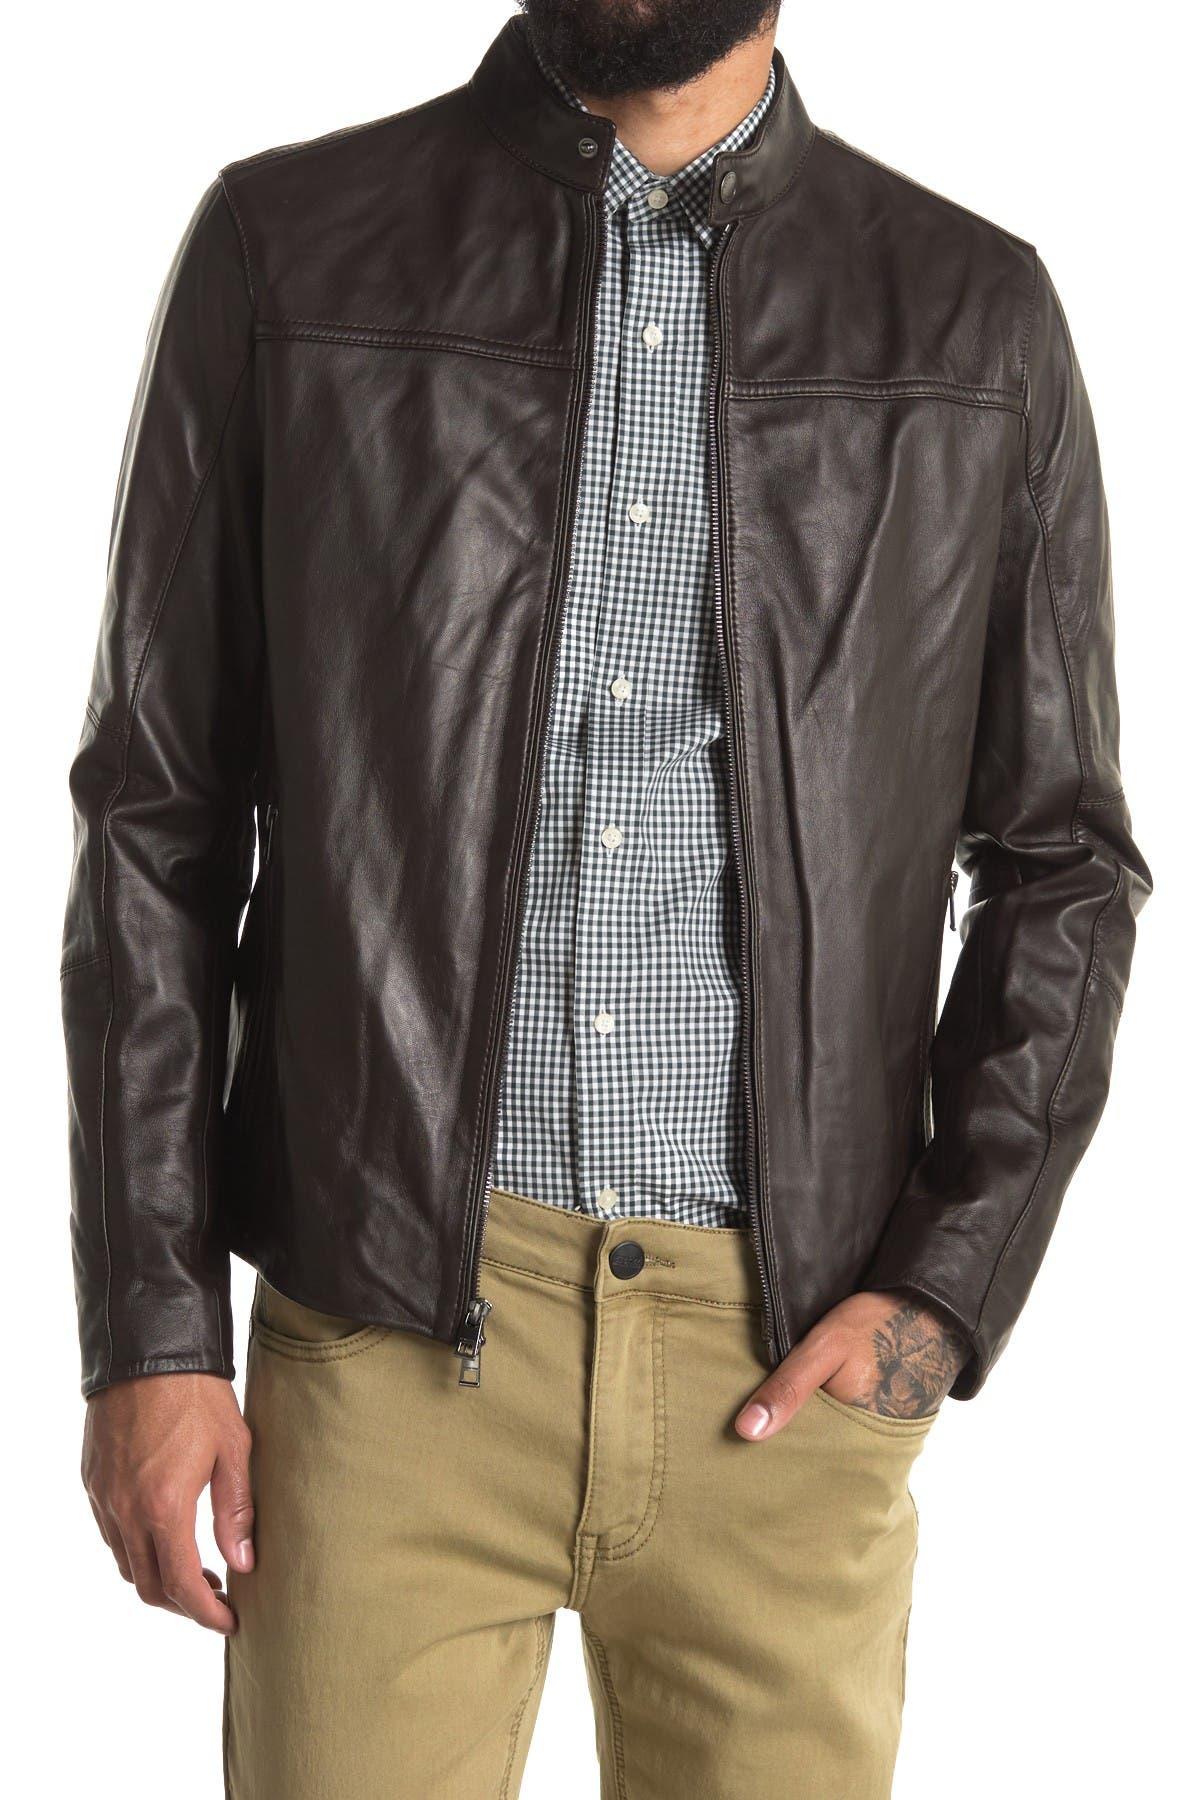 Image of Michael Kors Basic Racer Leather Jacket